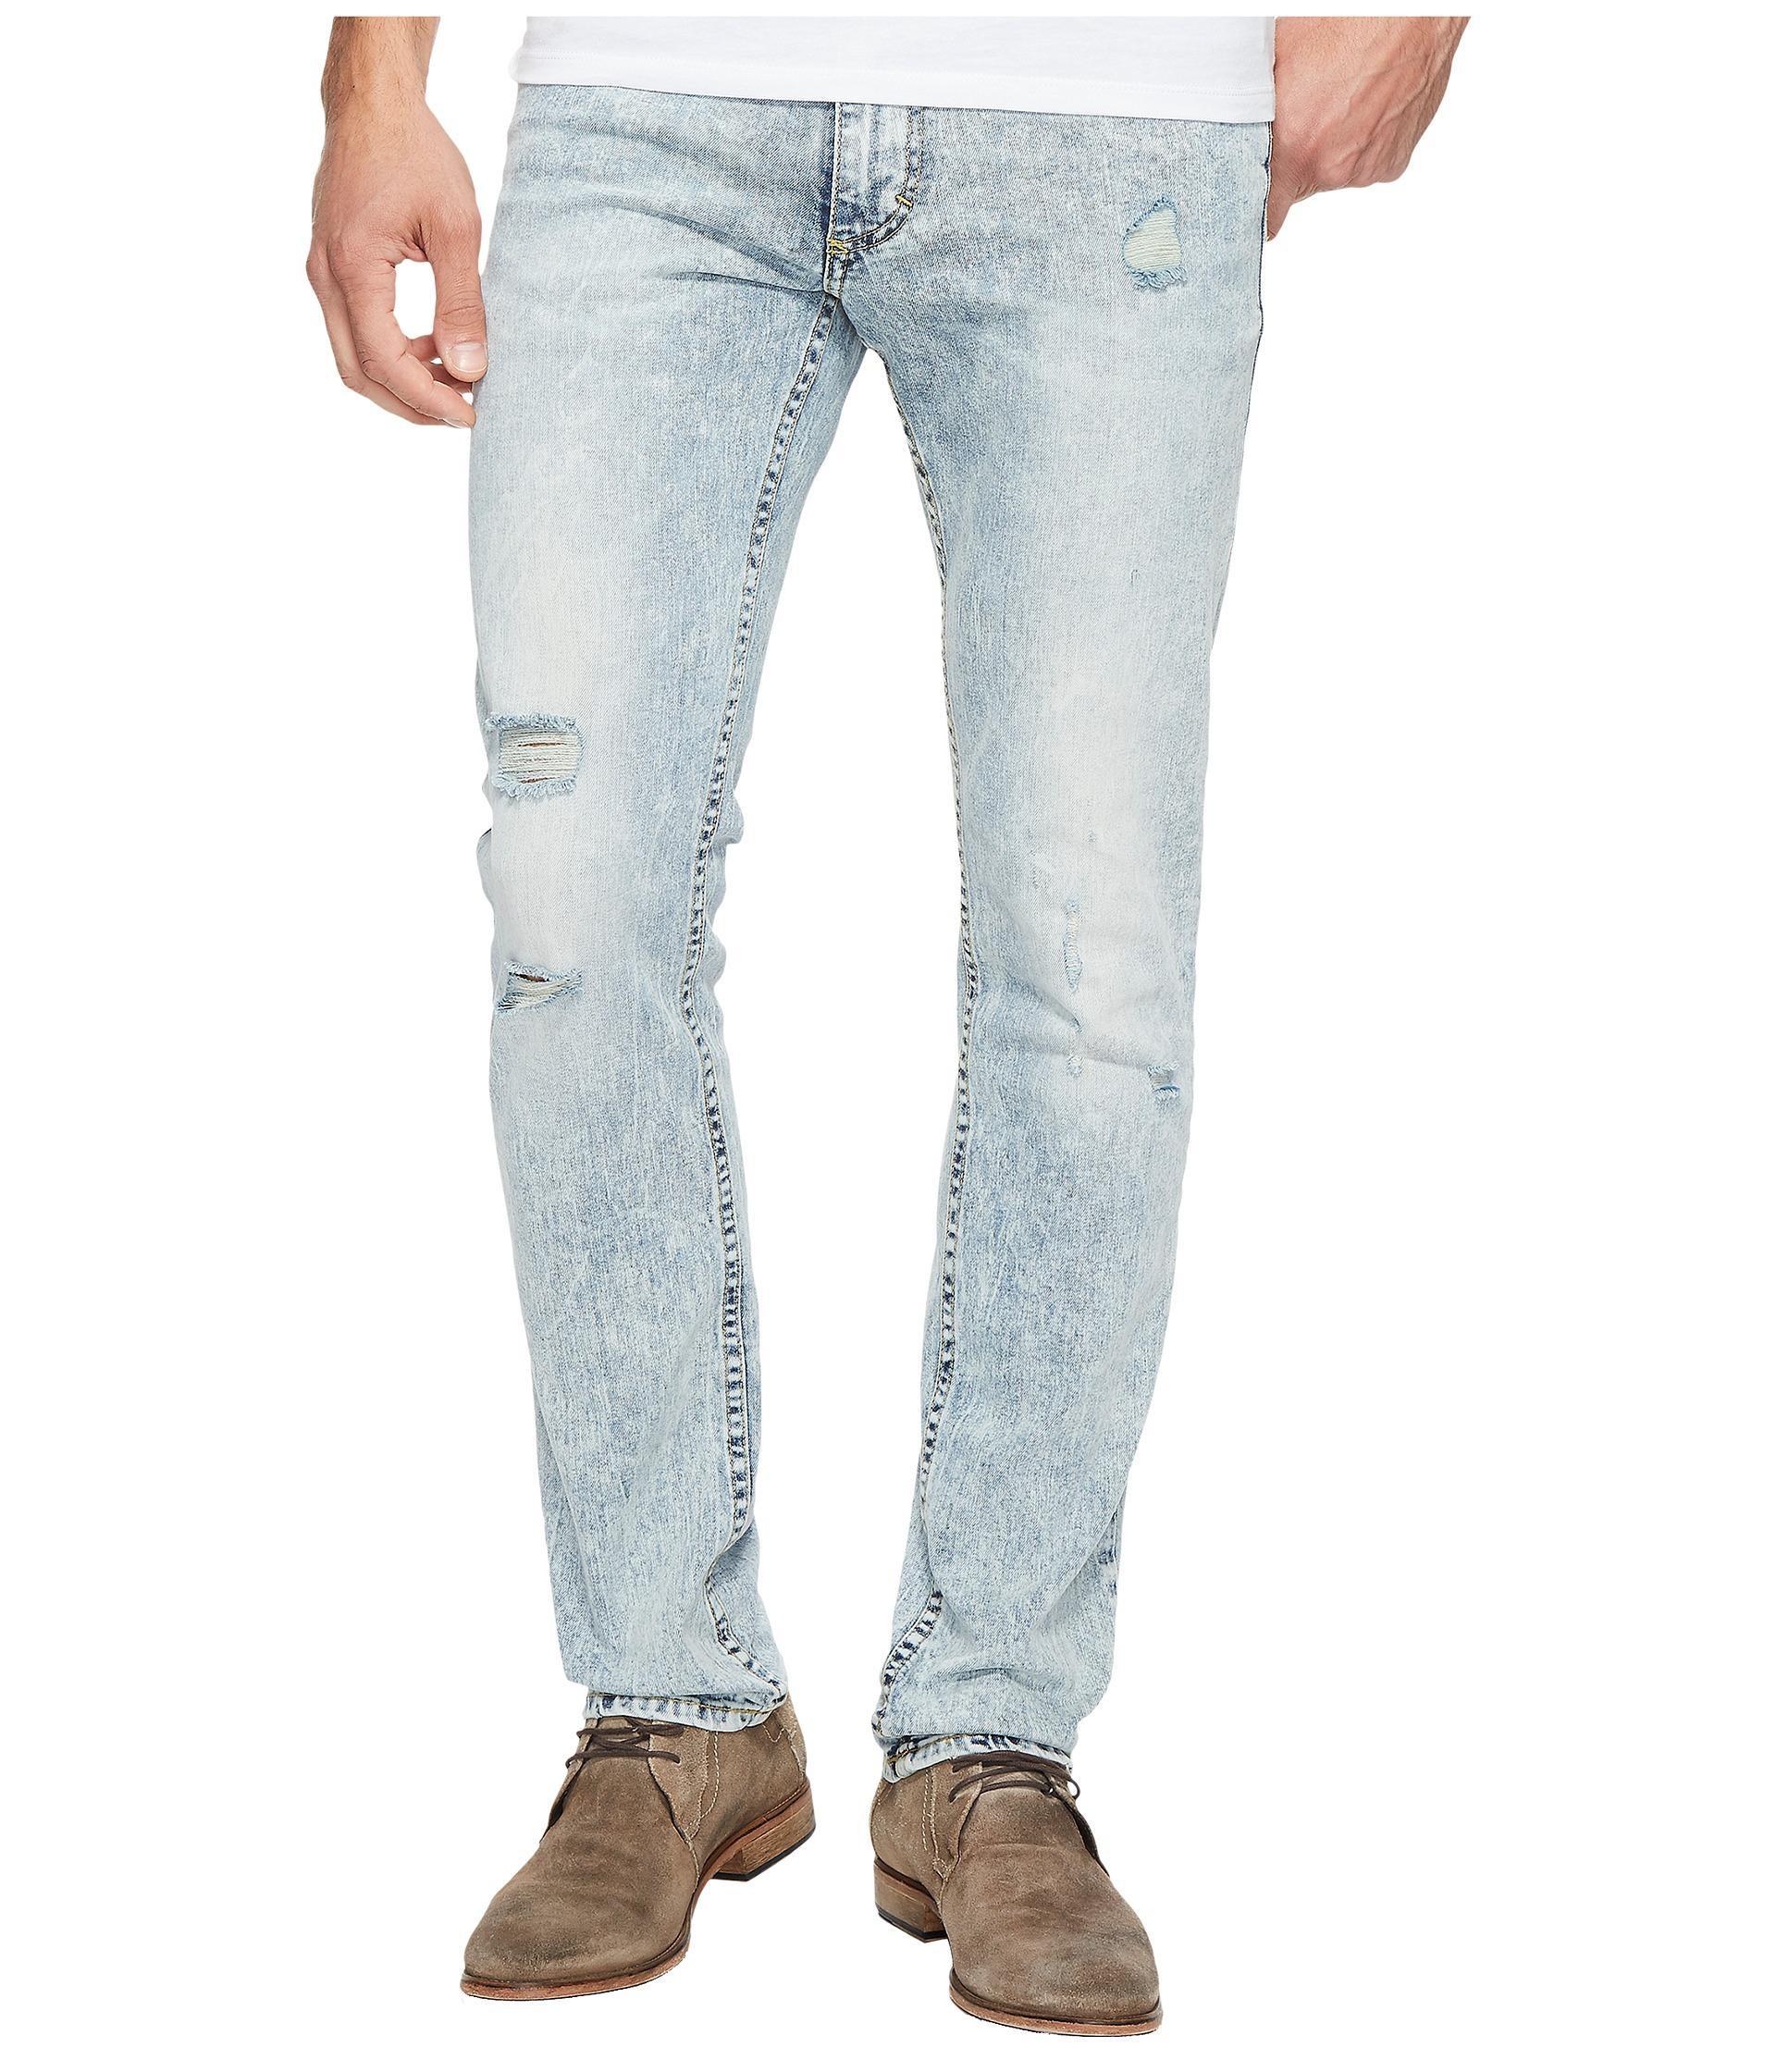 Lyst - Calvin Klein Jeans Slim Fit In Salt Water Indigo Wash in Blue ... eae0c97c119